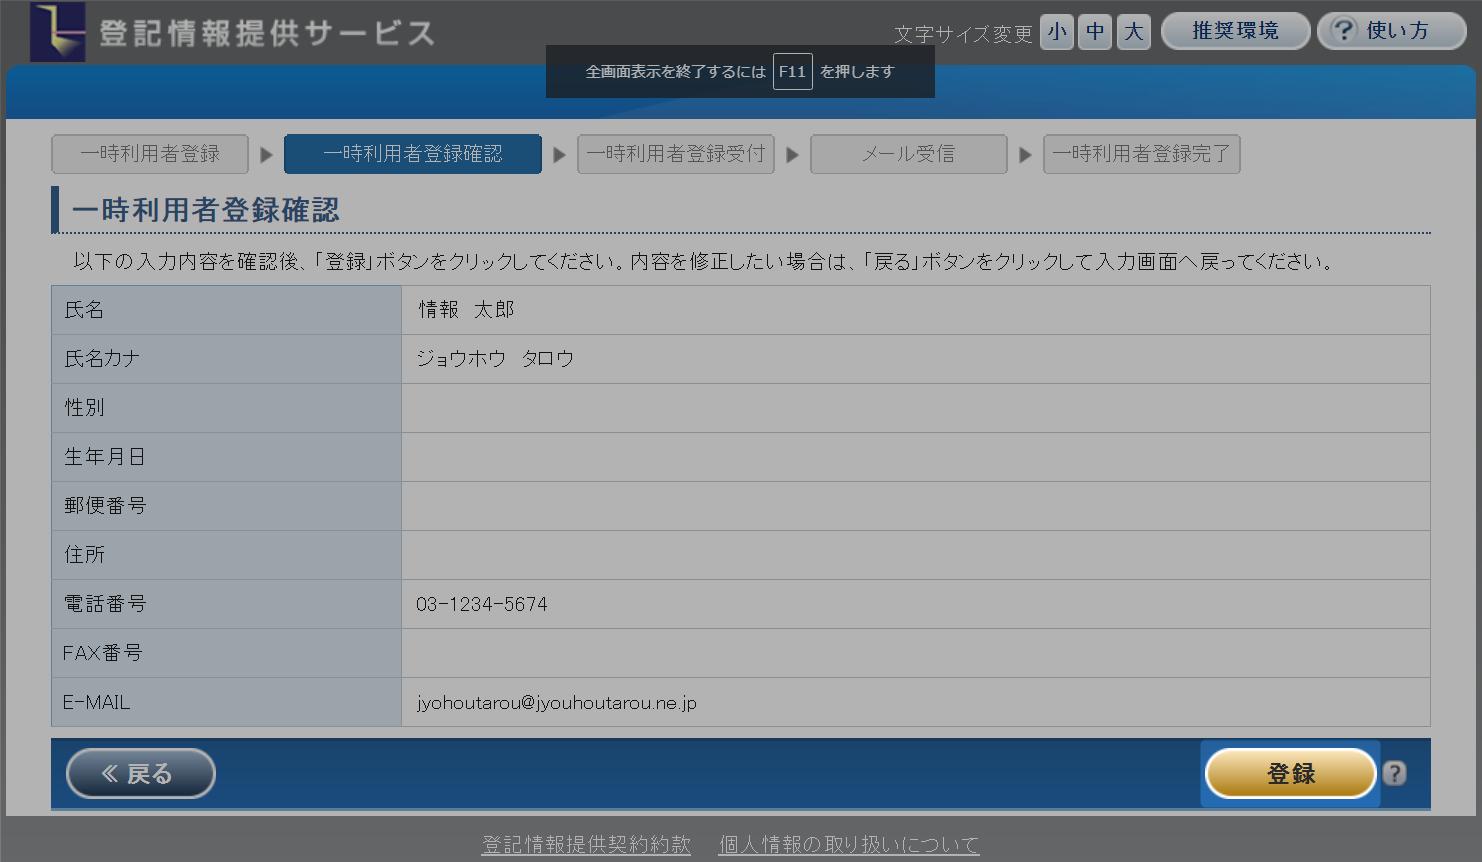 登記情報提供サービス 一時利用者登録確認